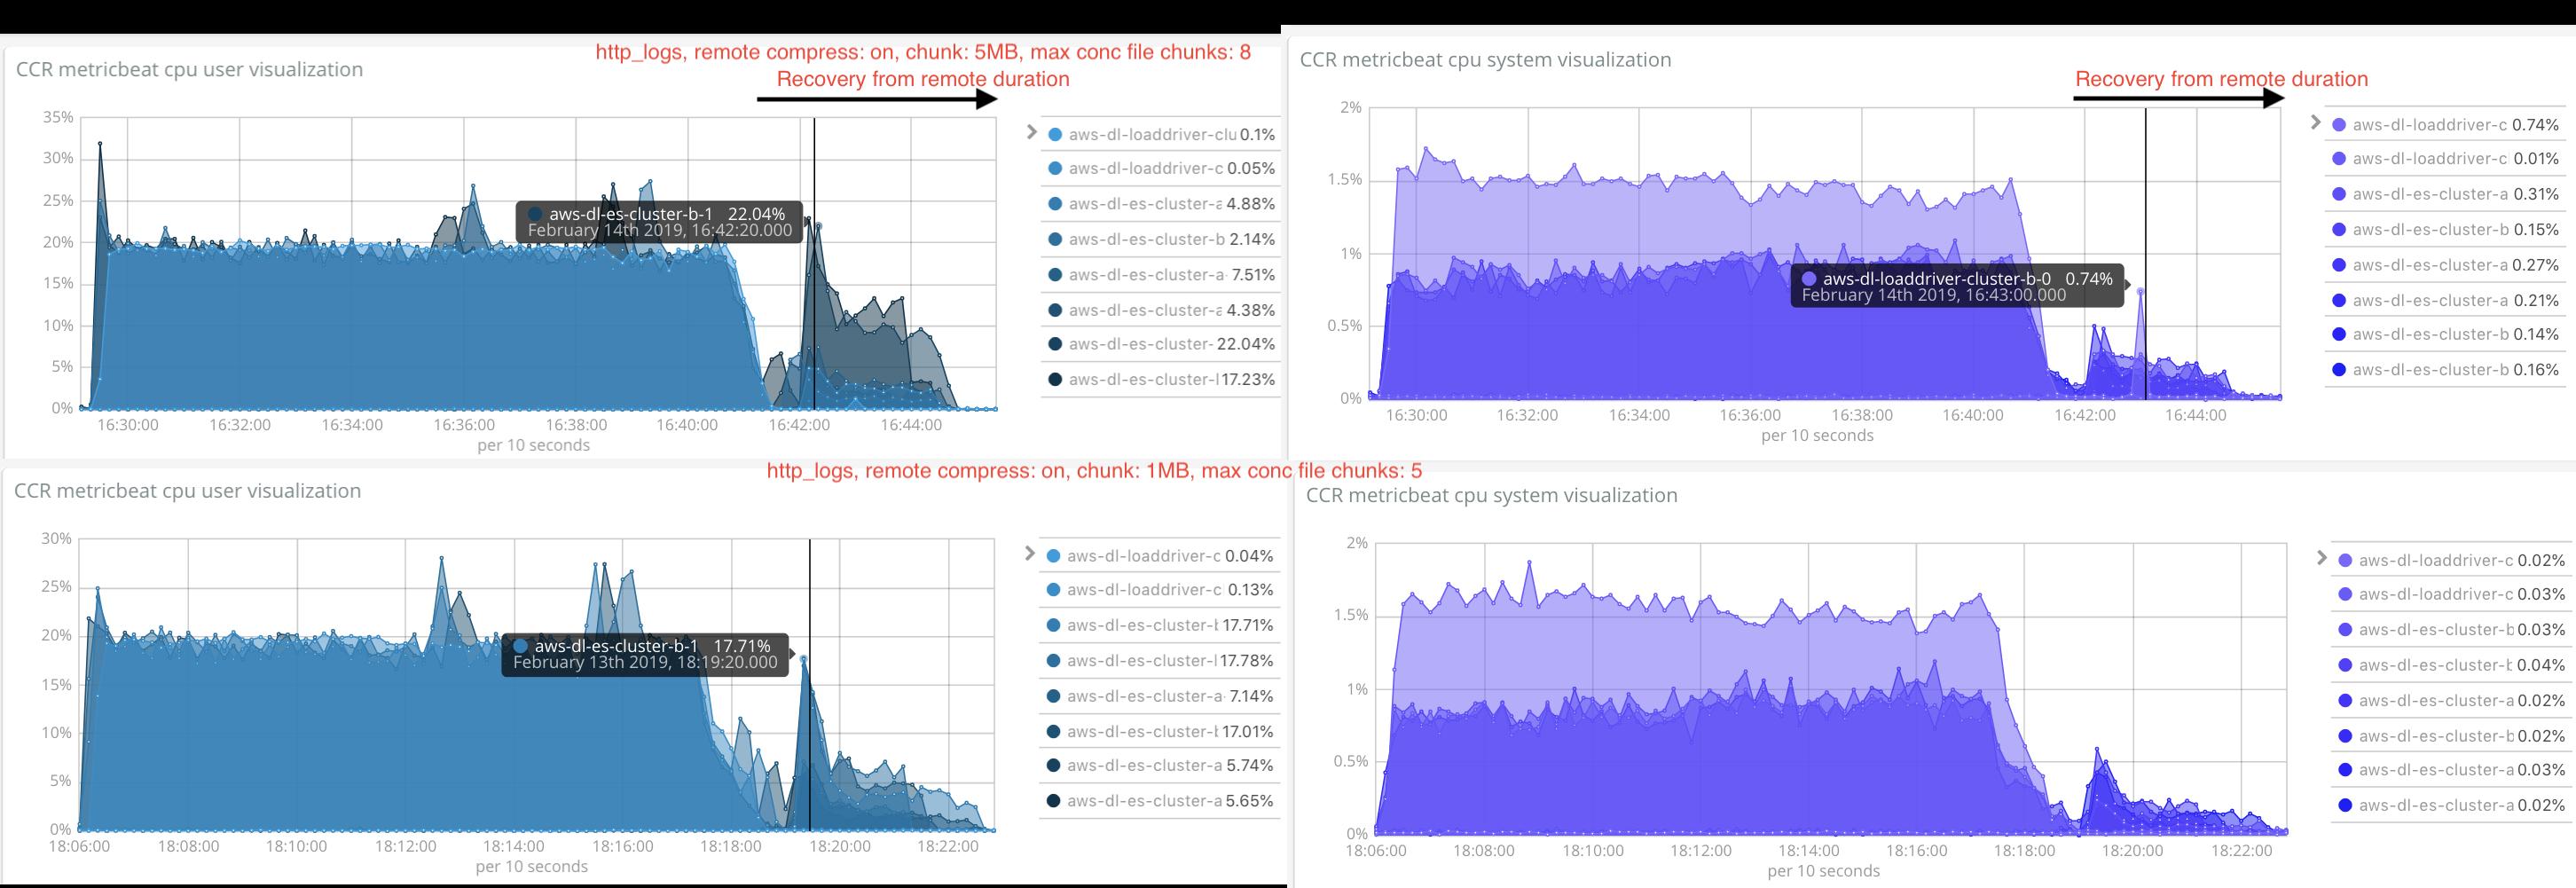 http_logs_cpu_usage_remotecompress_1mb_5conc-vs-5mb_8conc